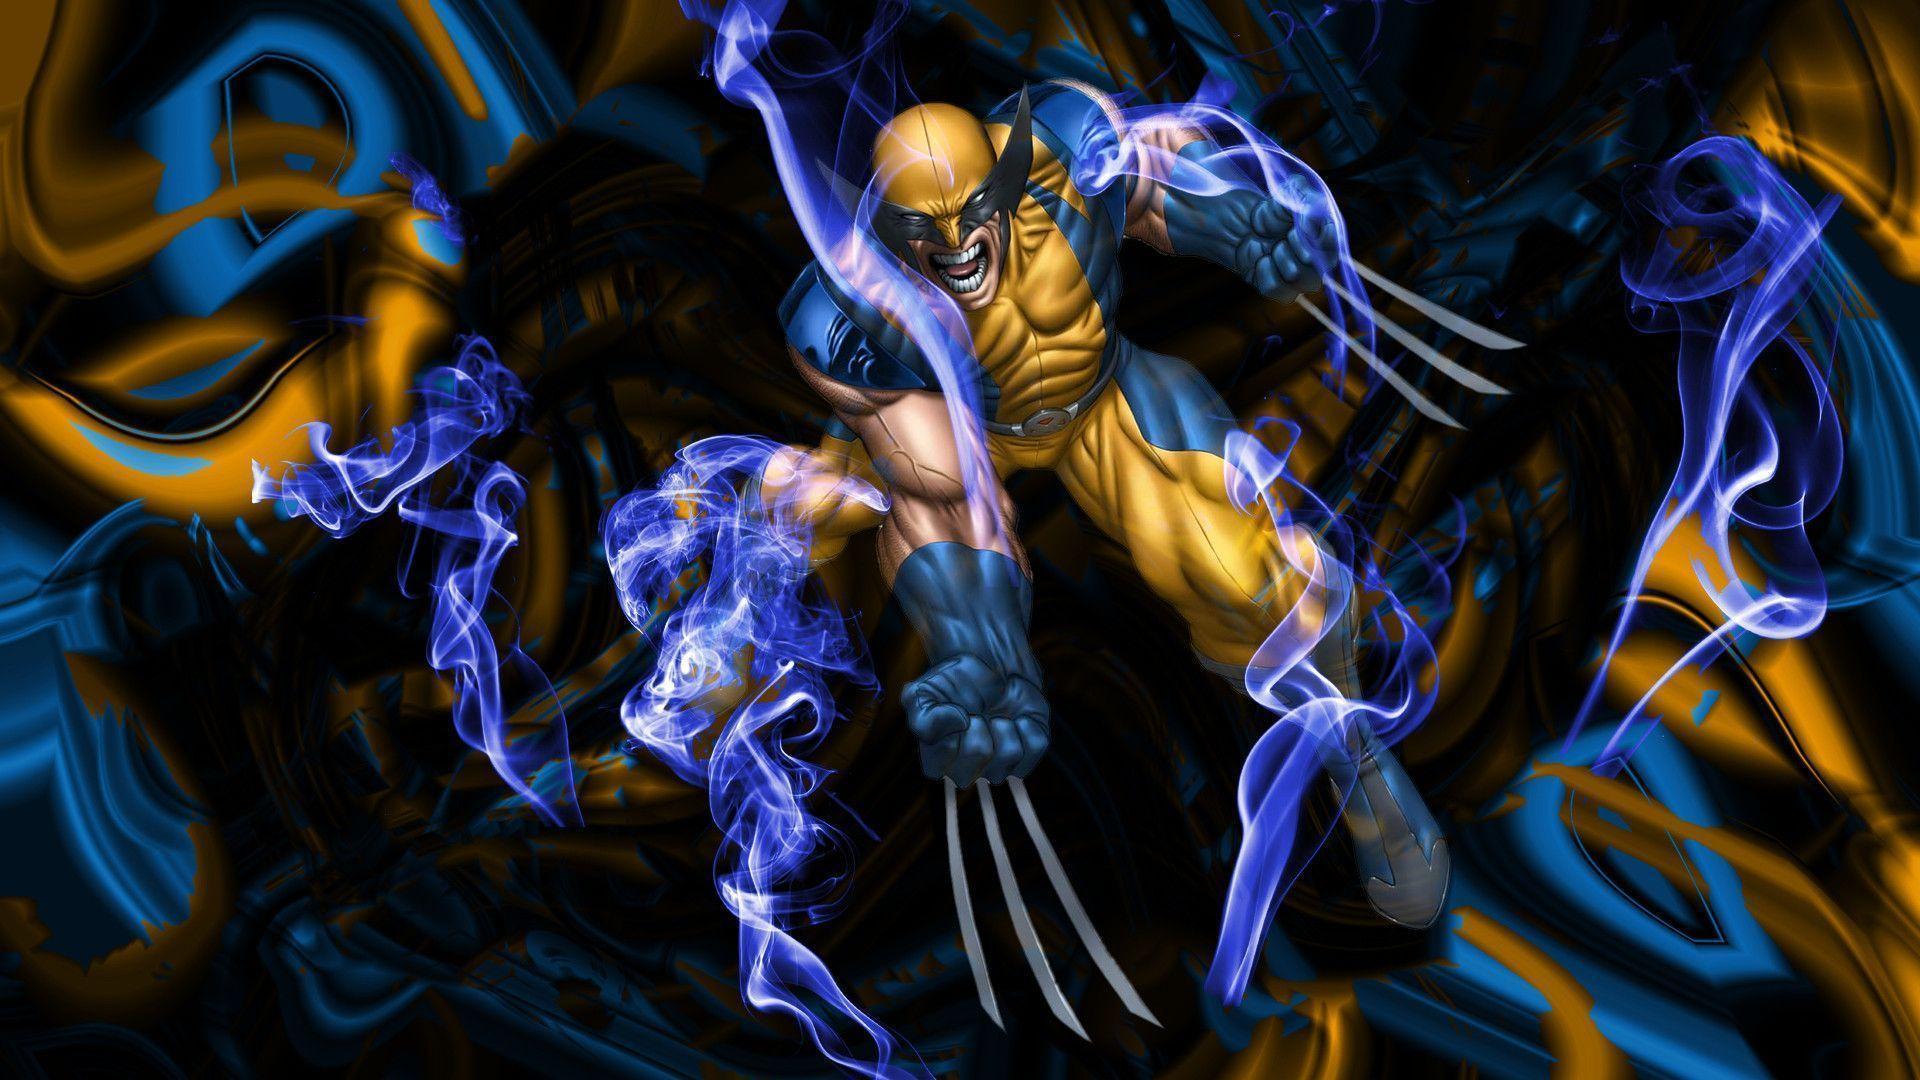 Wolverine Wallpaper HD #4909 Wallpaper | HD Wallpaper